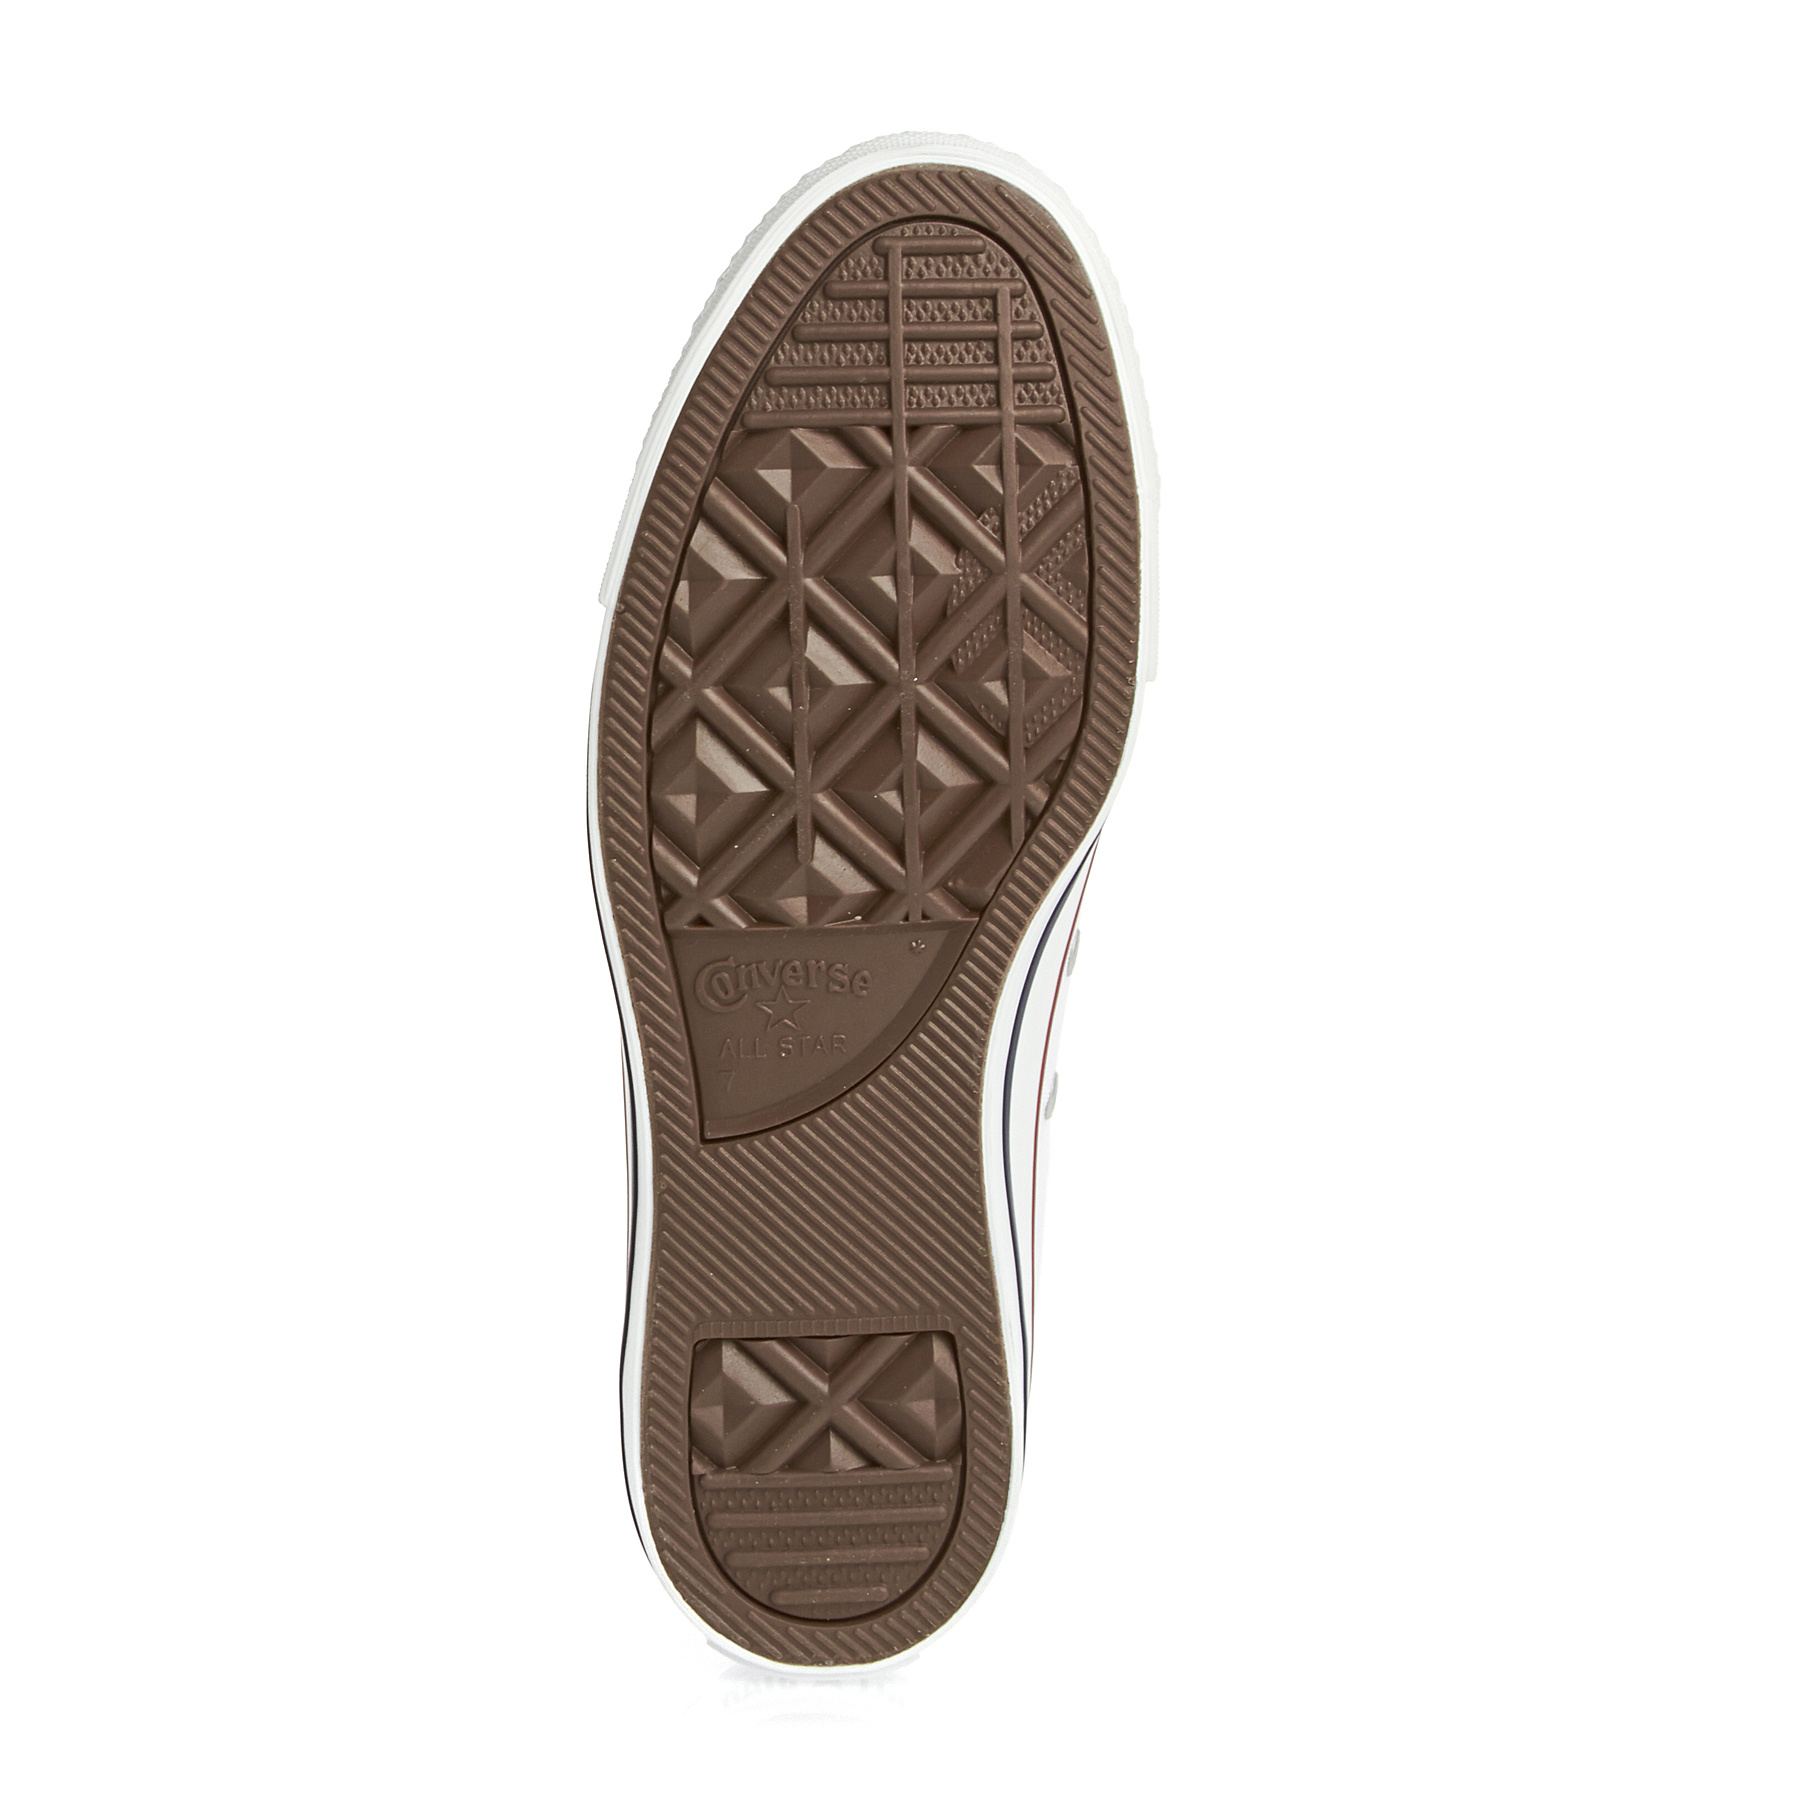 Stars OxLivraison Chaussures Chuck All Converse Gratuite